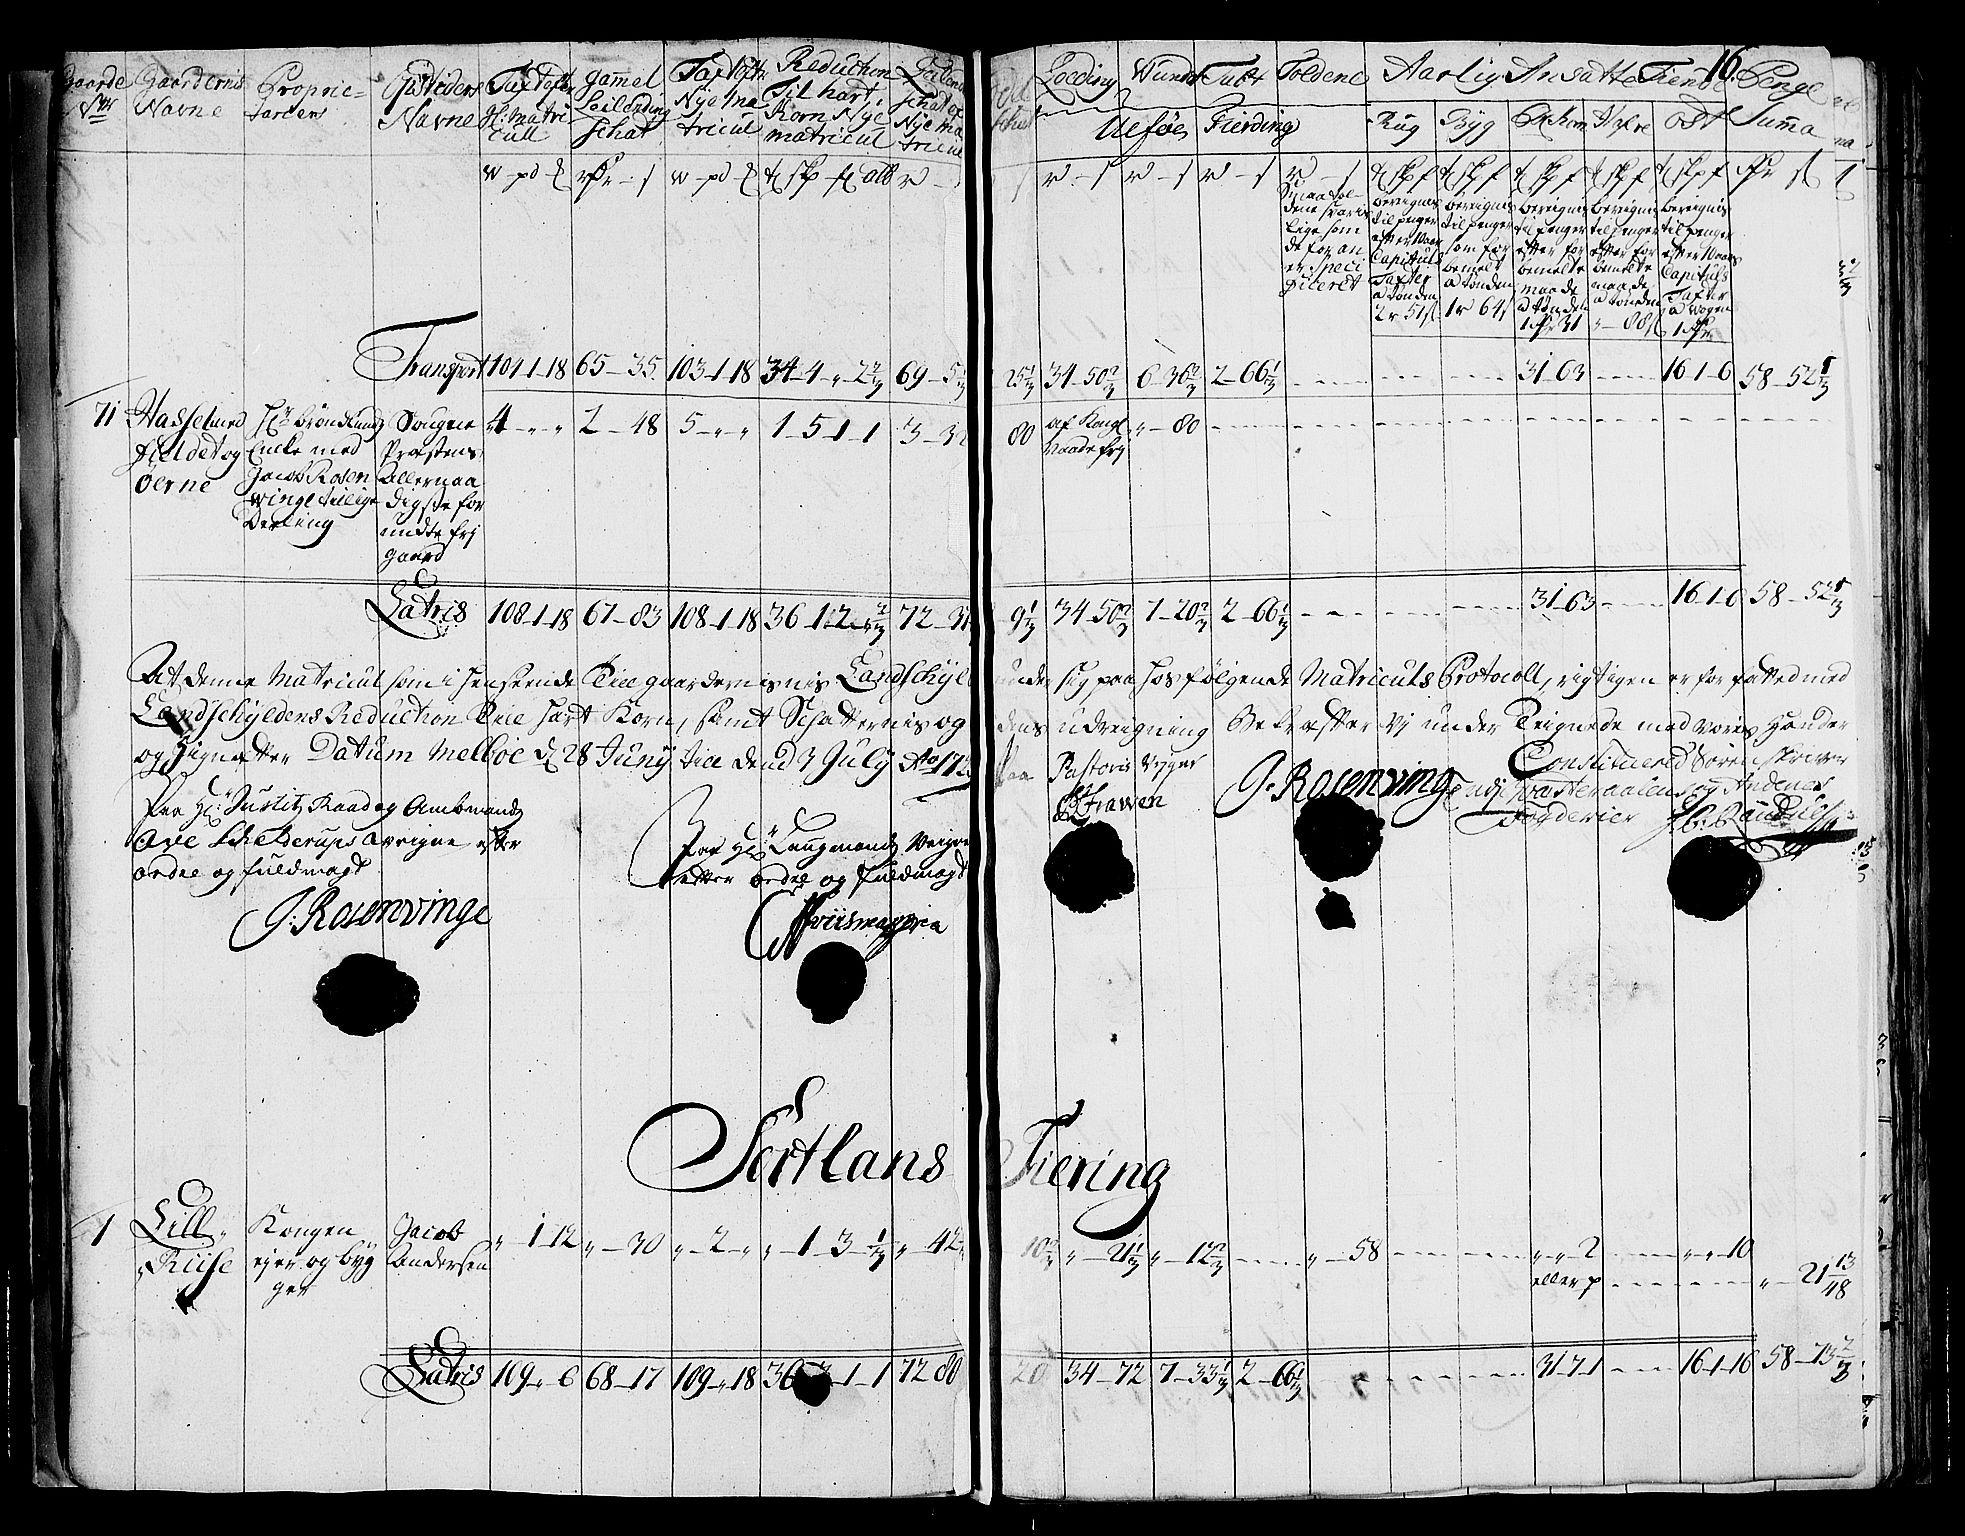 RA, Rentekammeret inntil 1814, Realistisk ordnet avdeling, N/Nb/Nbf/L0177: Vesterålen og Andenes matrikkelprotokoll, 1723, s. 15b-16a